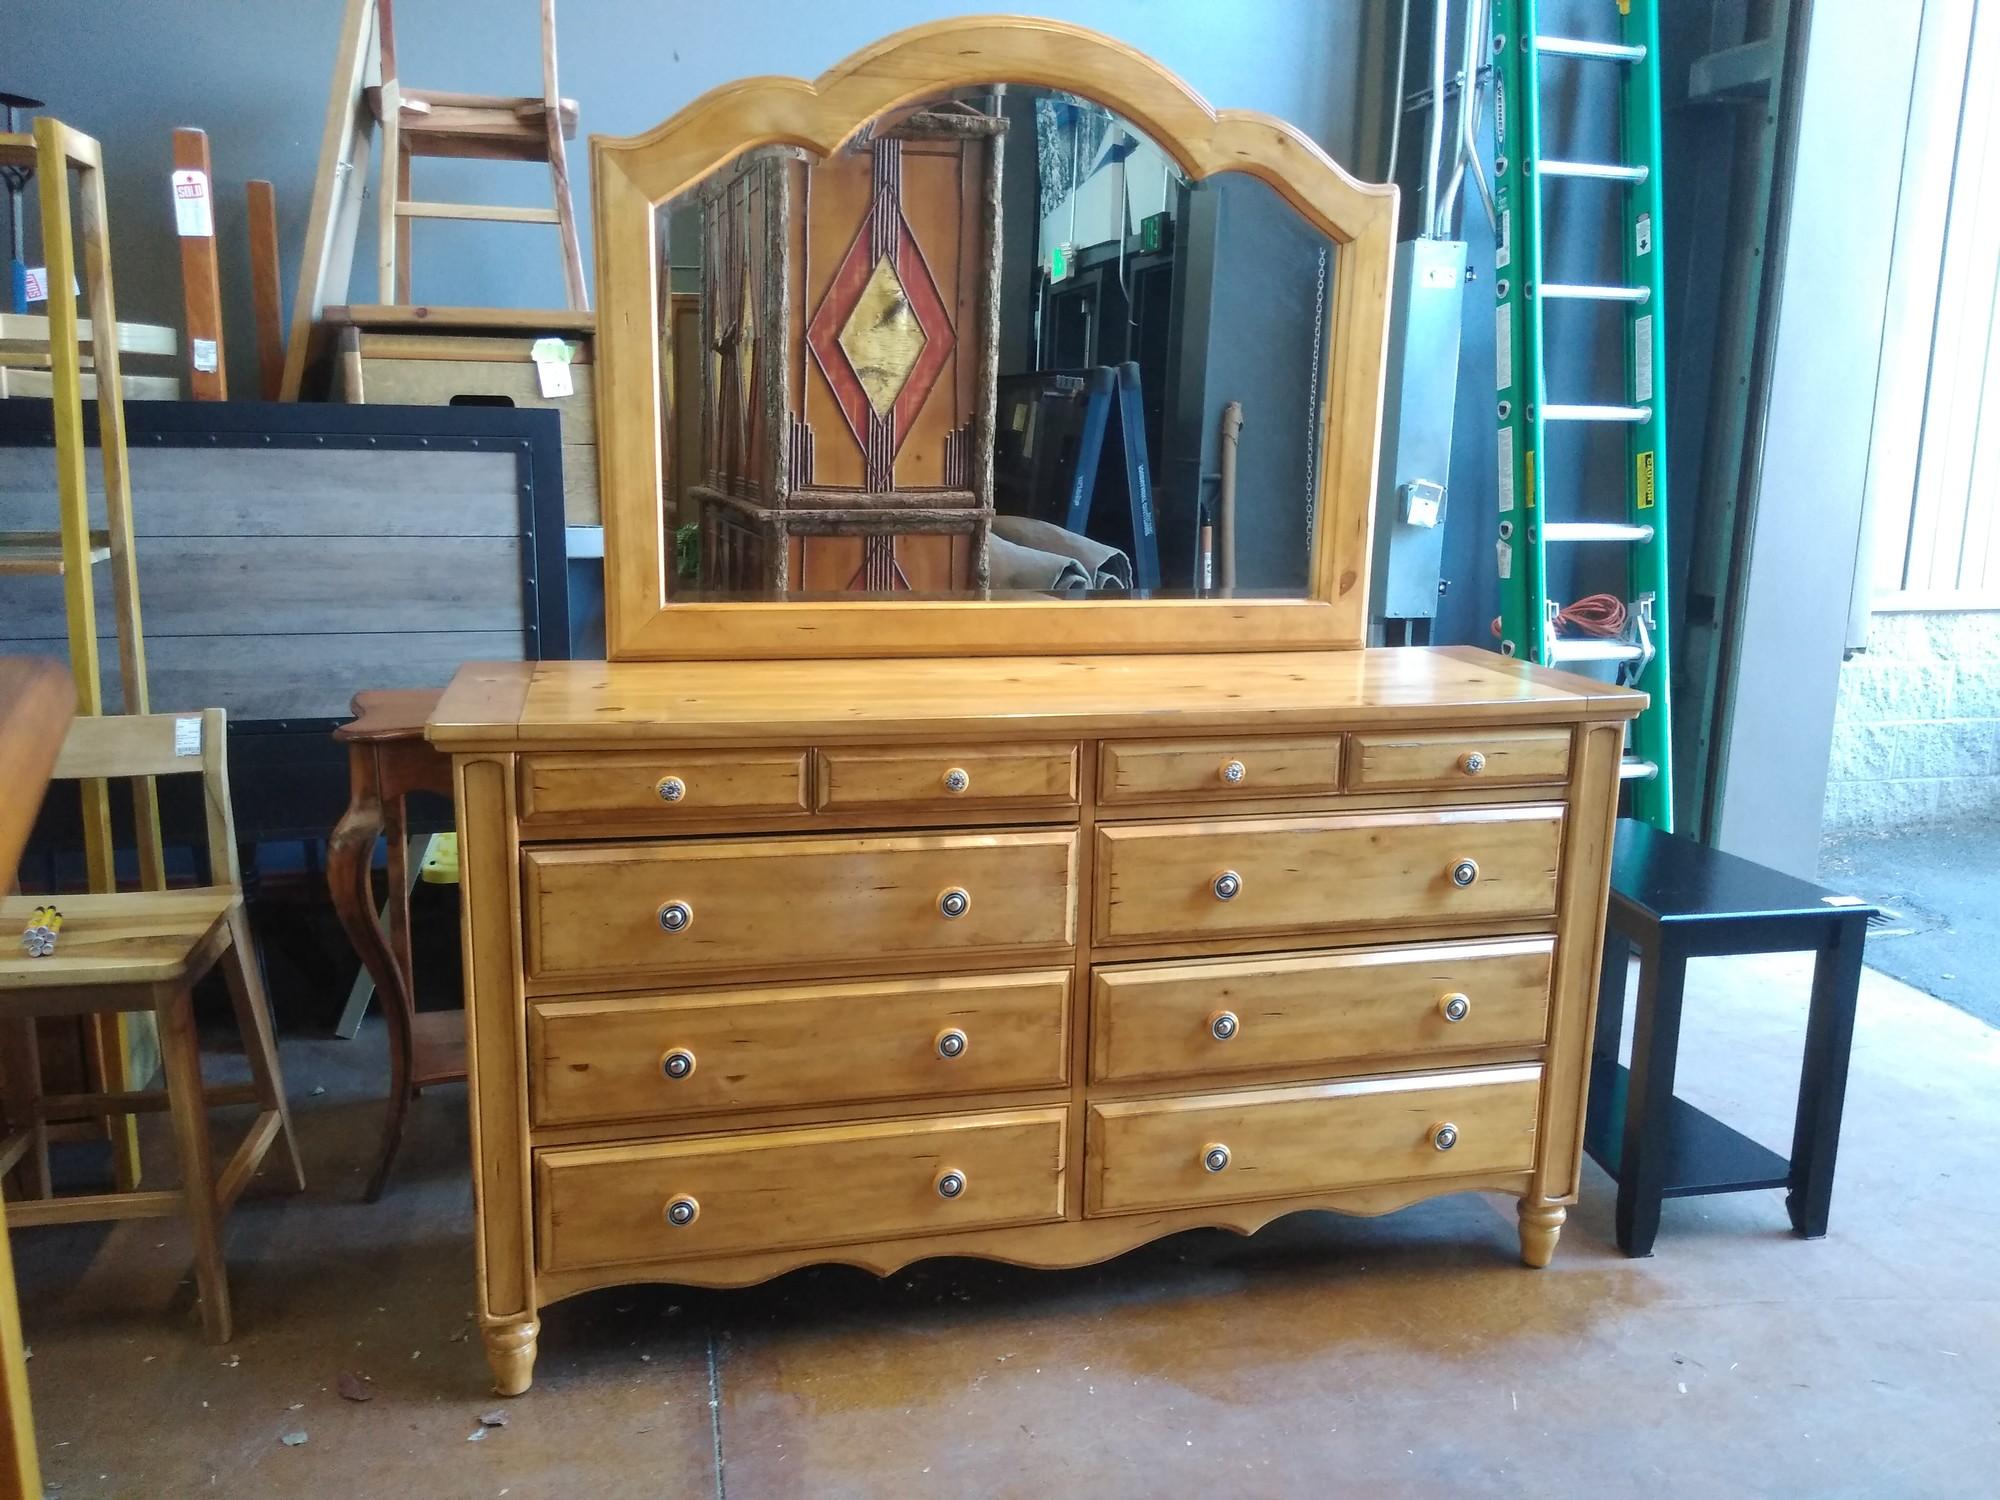 Aspenhome Dresser & Mirror<br /> 21Lx70Wx78H